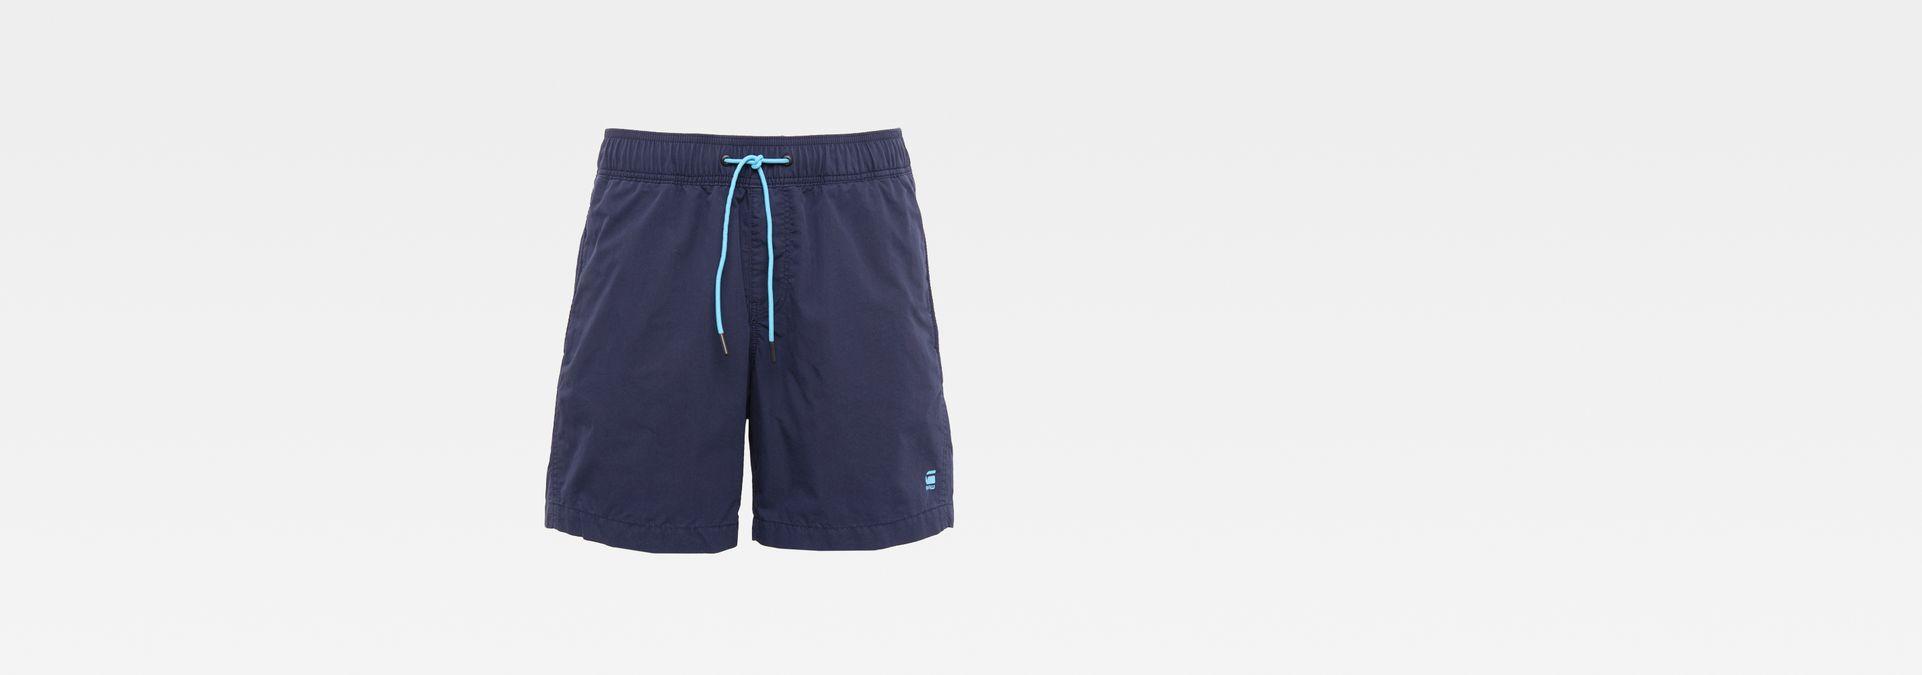 15ecbbece7b1f G-Star RAW® Dirik Swim Shorts Dark blue front bust ...